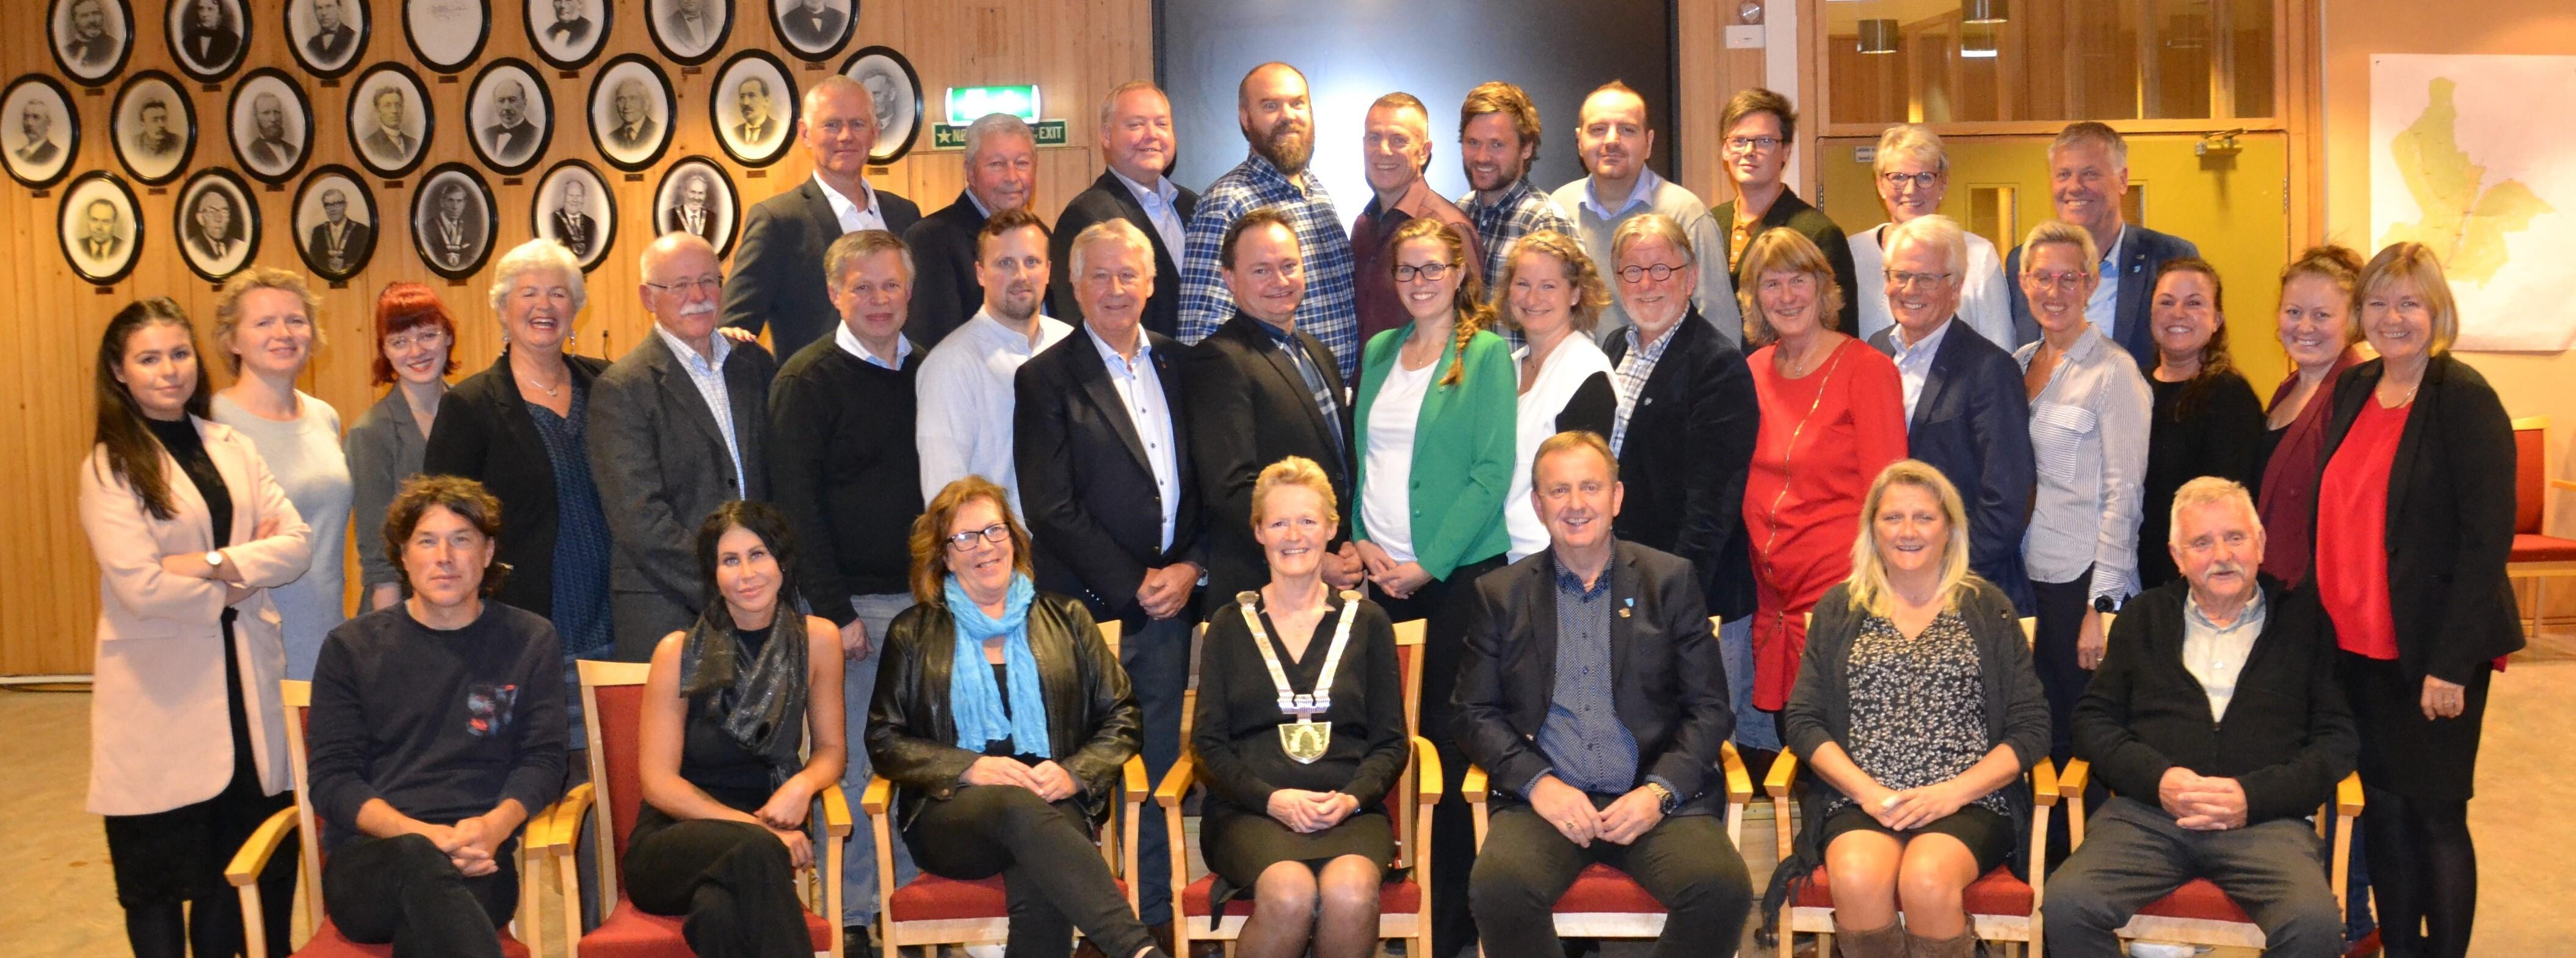 Kommunestyre 14.10.20019-2.jpg